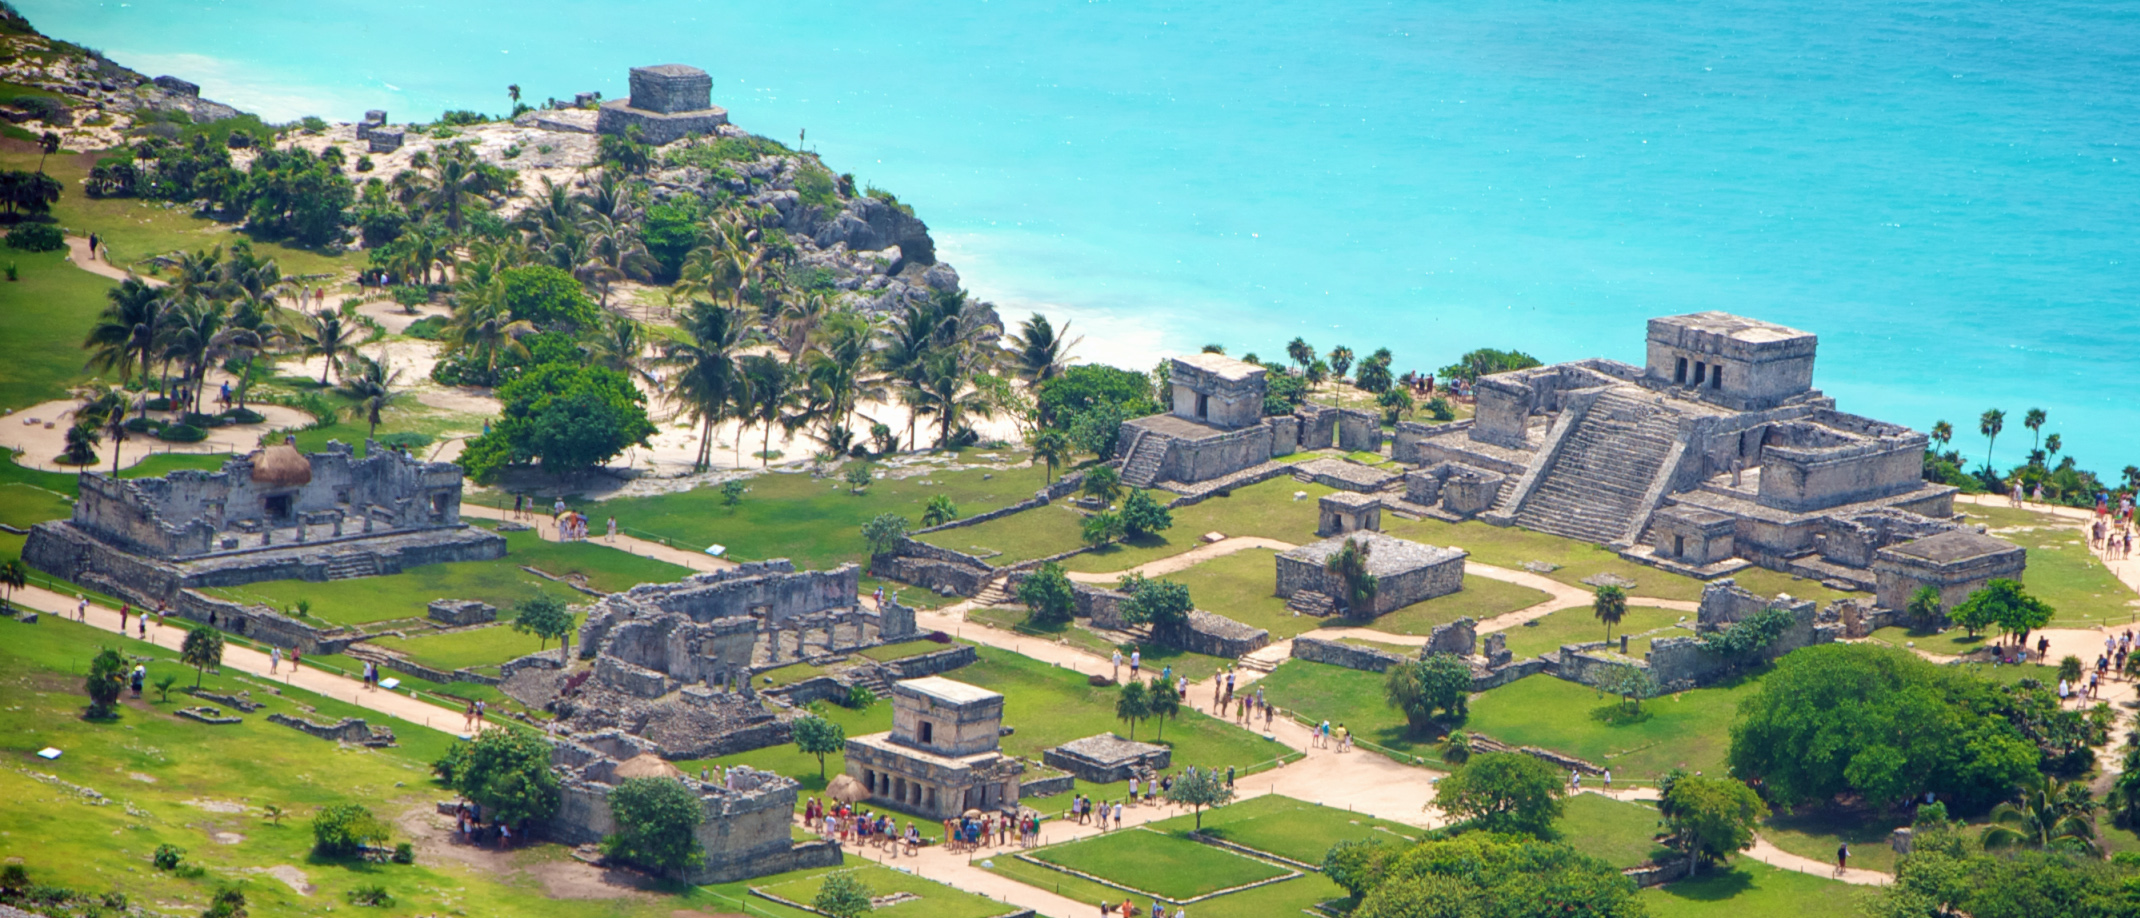 Best Beaches In Riviera Maya